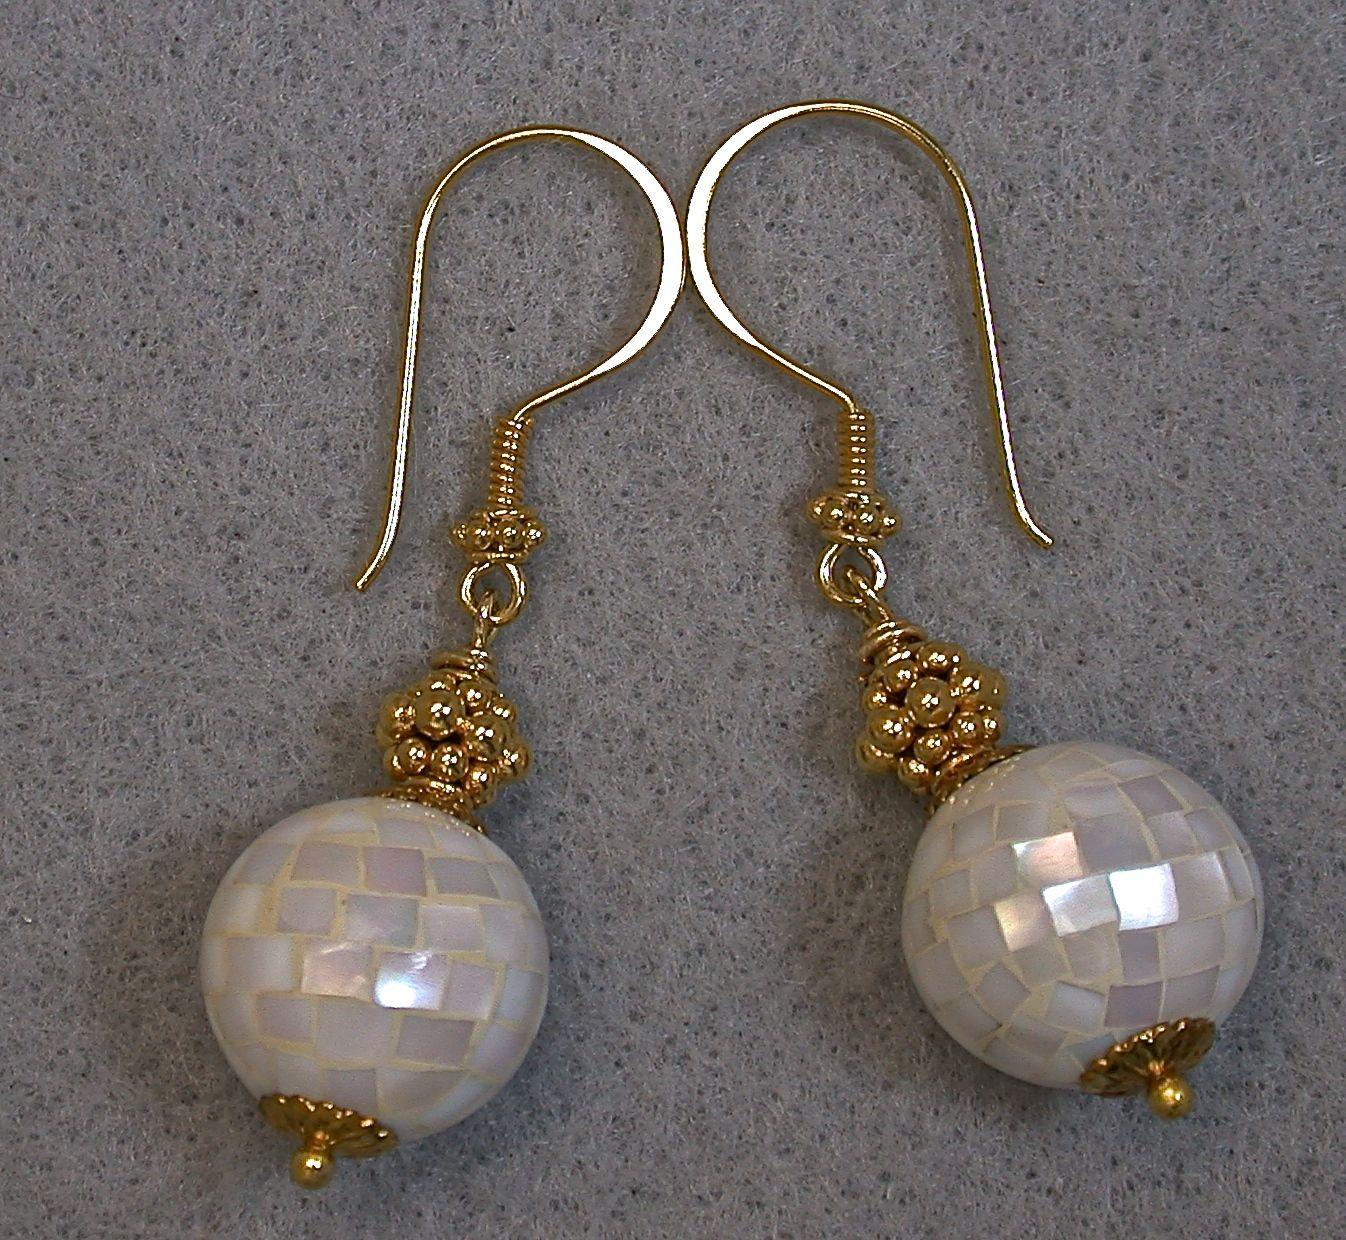 Vintage Handmade Abalone Bead Earrings